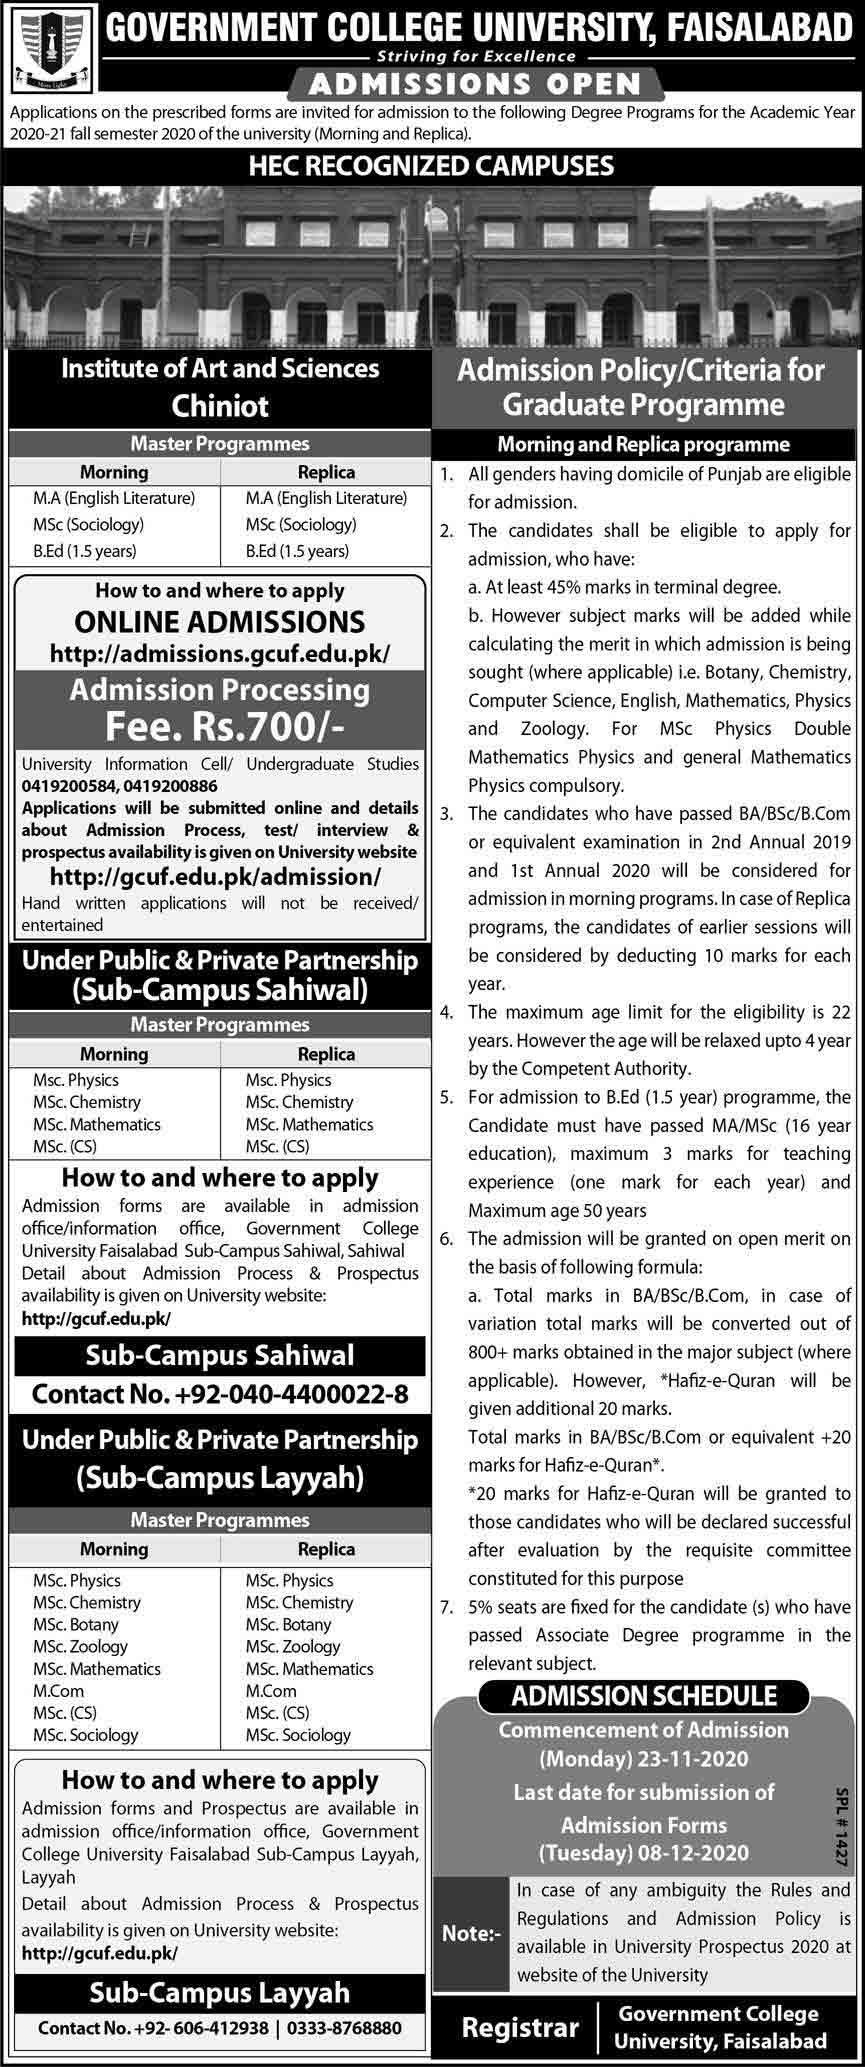 GCUF-Faisalabad-Admission-2021